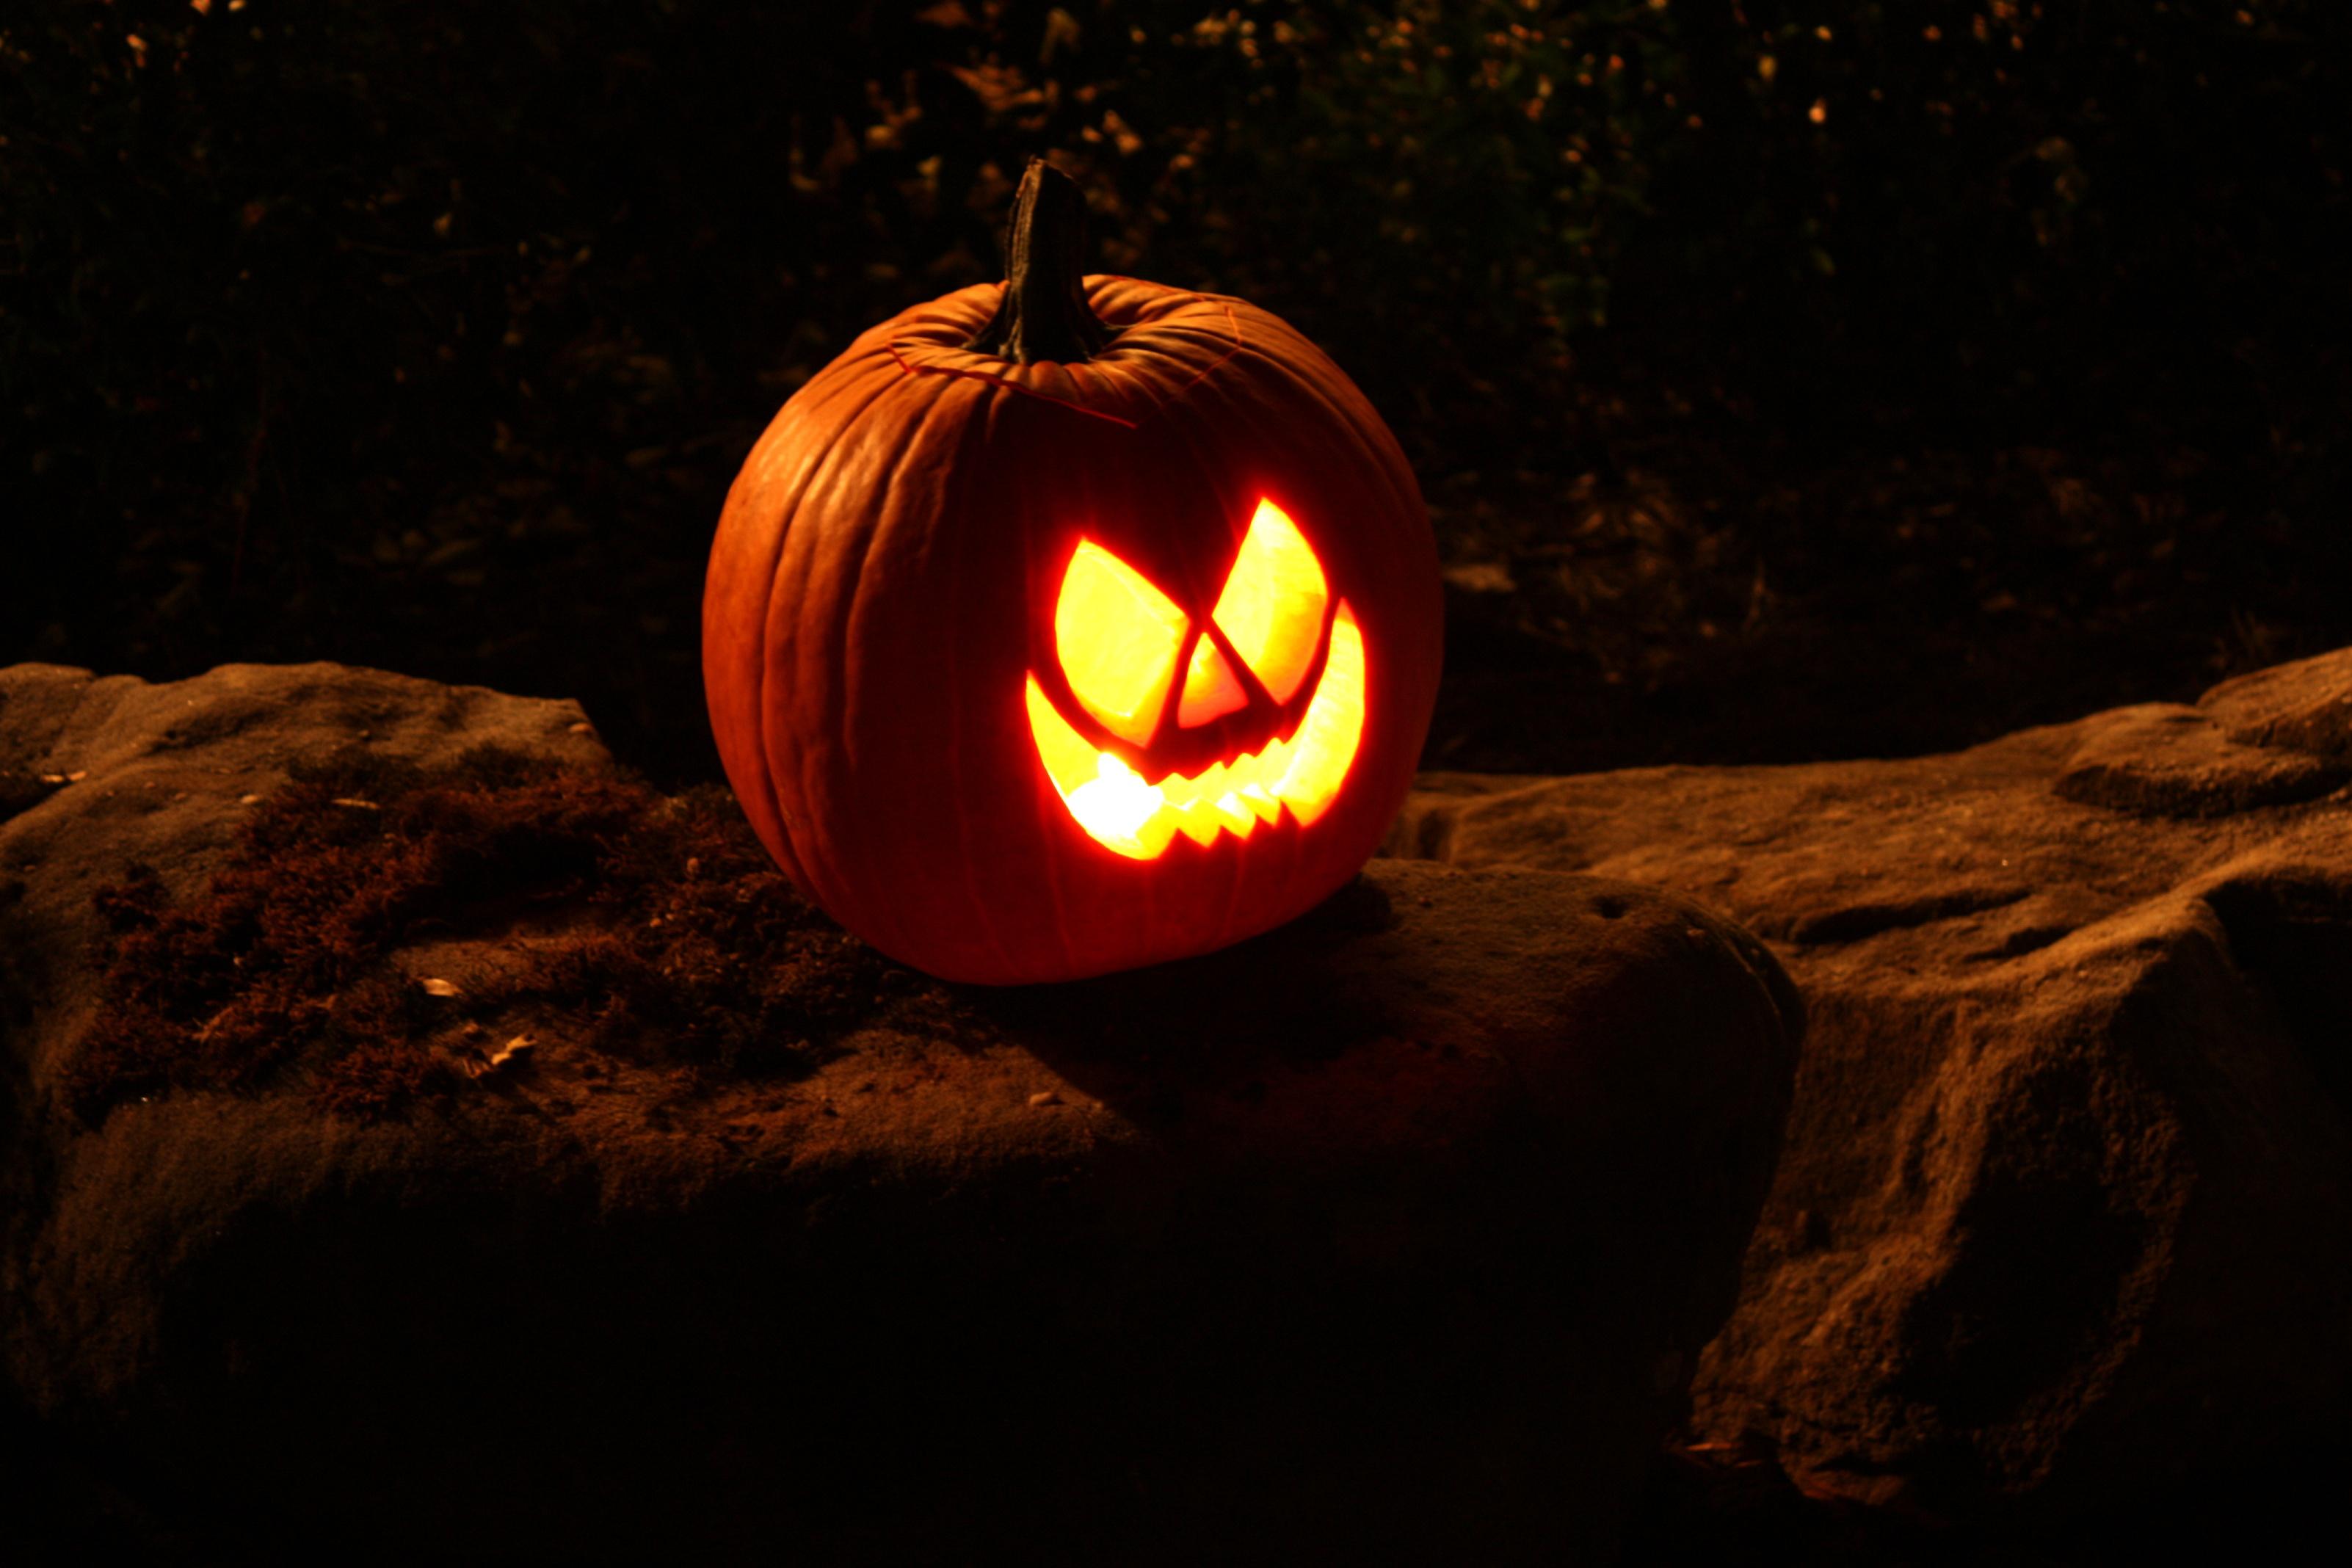 A Halloween jack-o-lantern on a rock, Events, Faces, Food, Halloween, HQ Photo